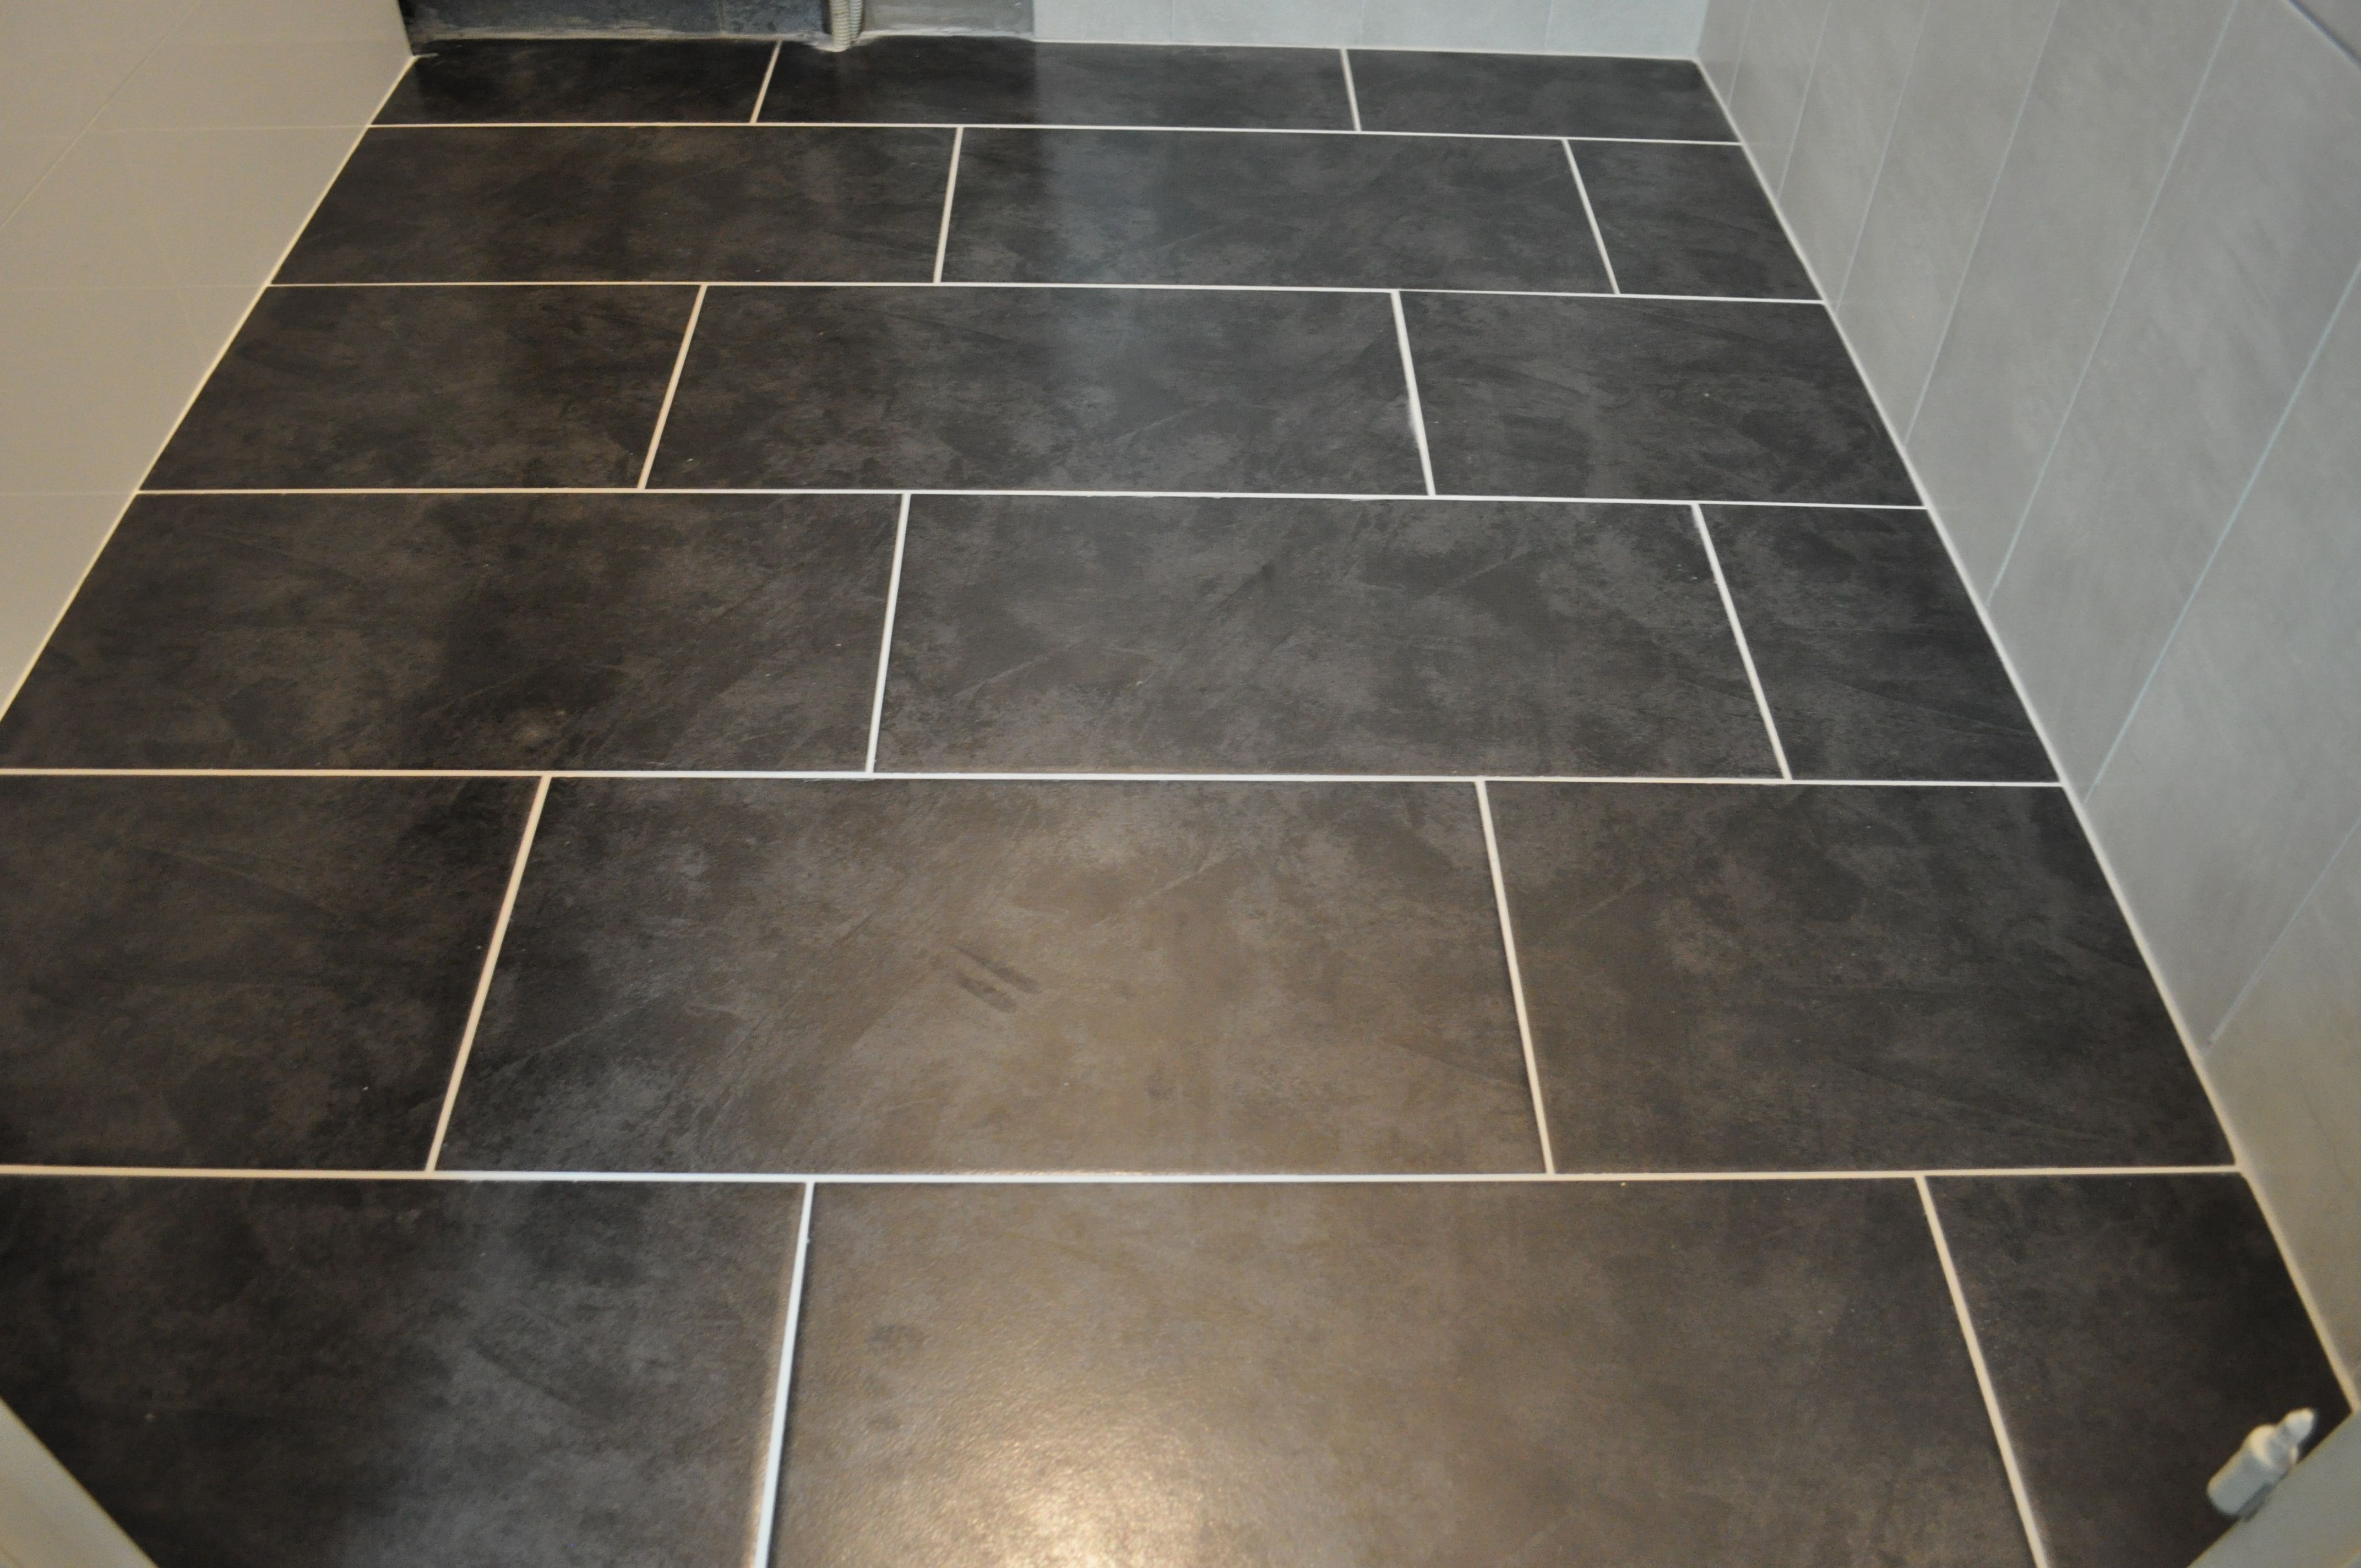 L Arc Interior Floor Tiles Bodenfliesen Bodenfliesen Muster Boden